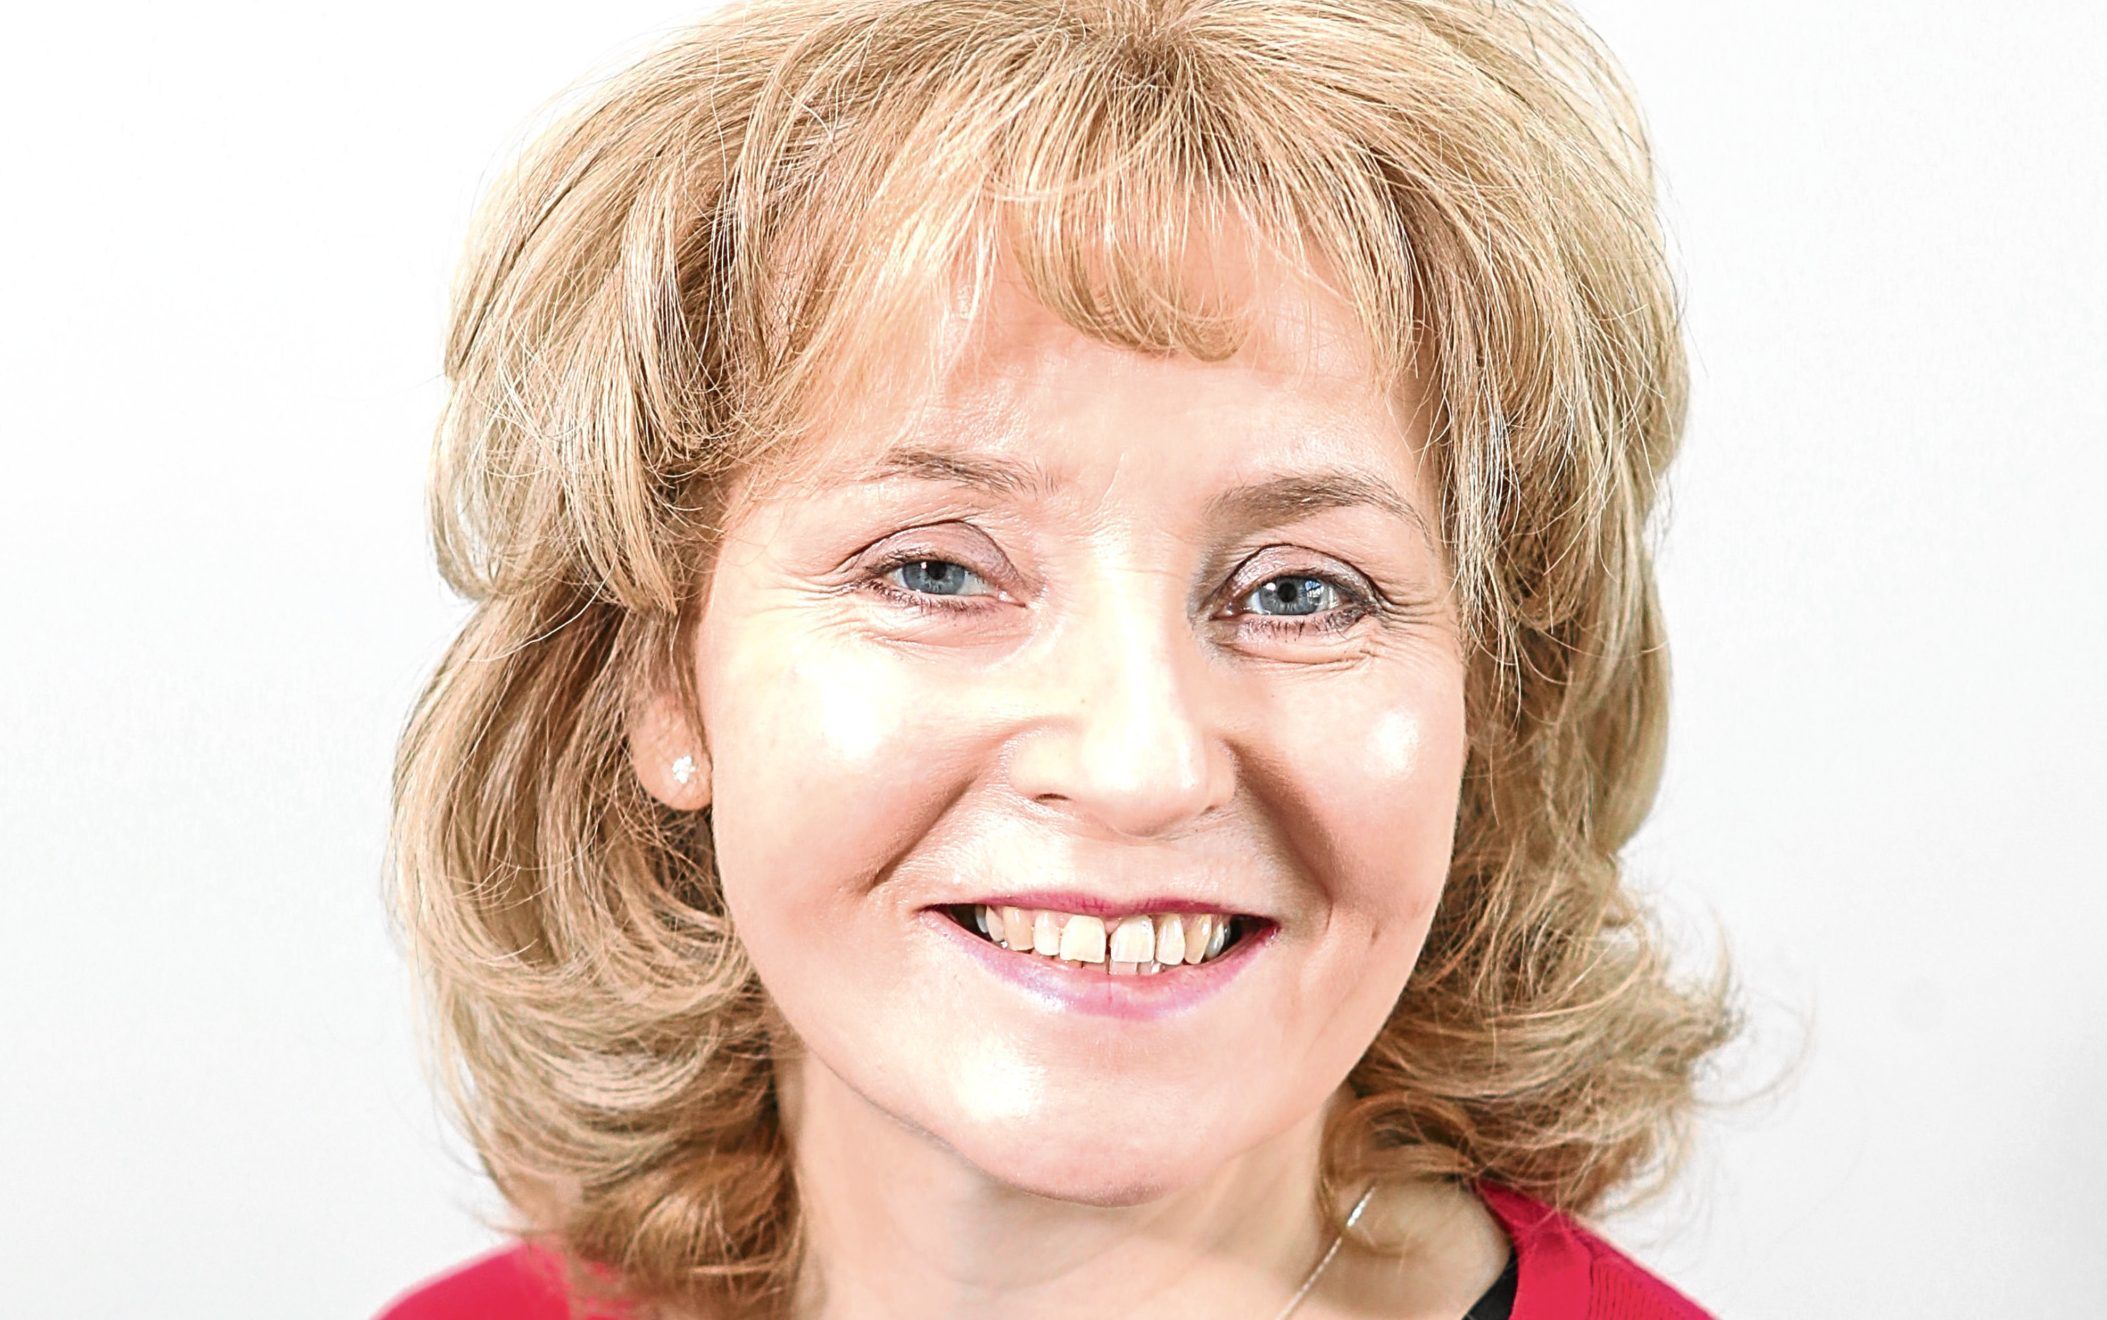 Sunday Post reporter Janet Boyle